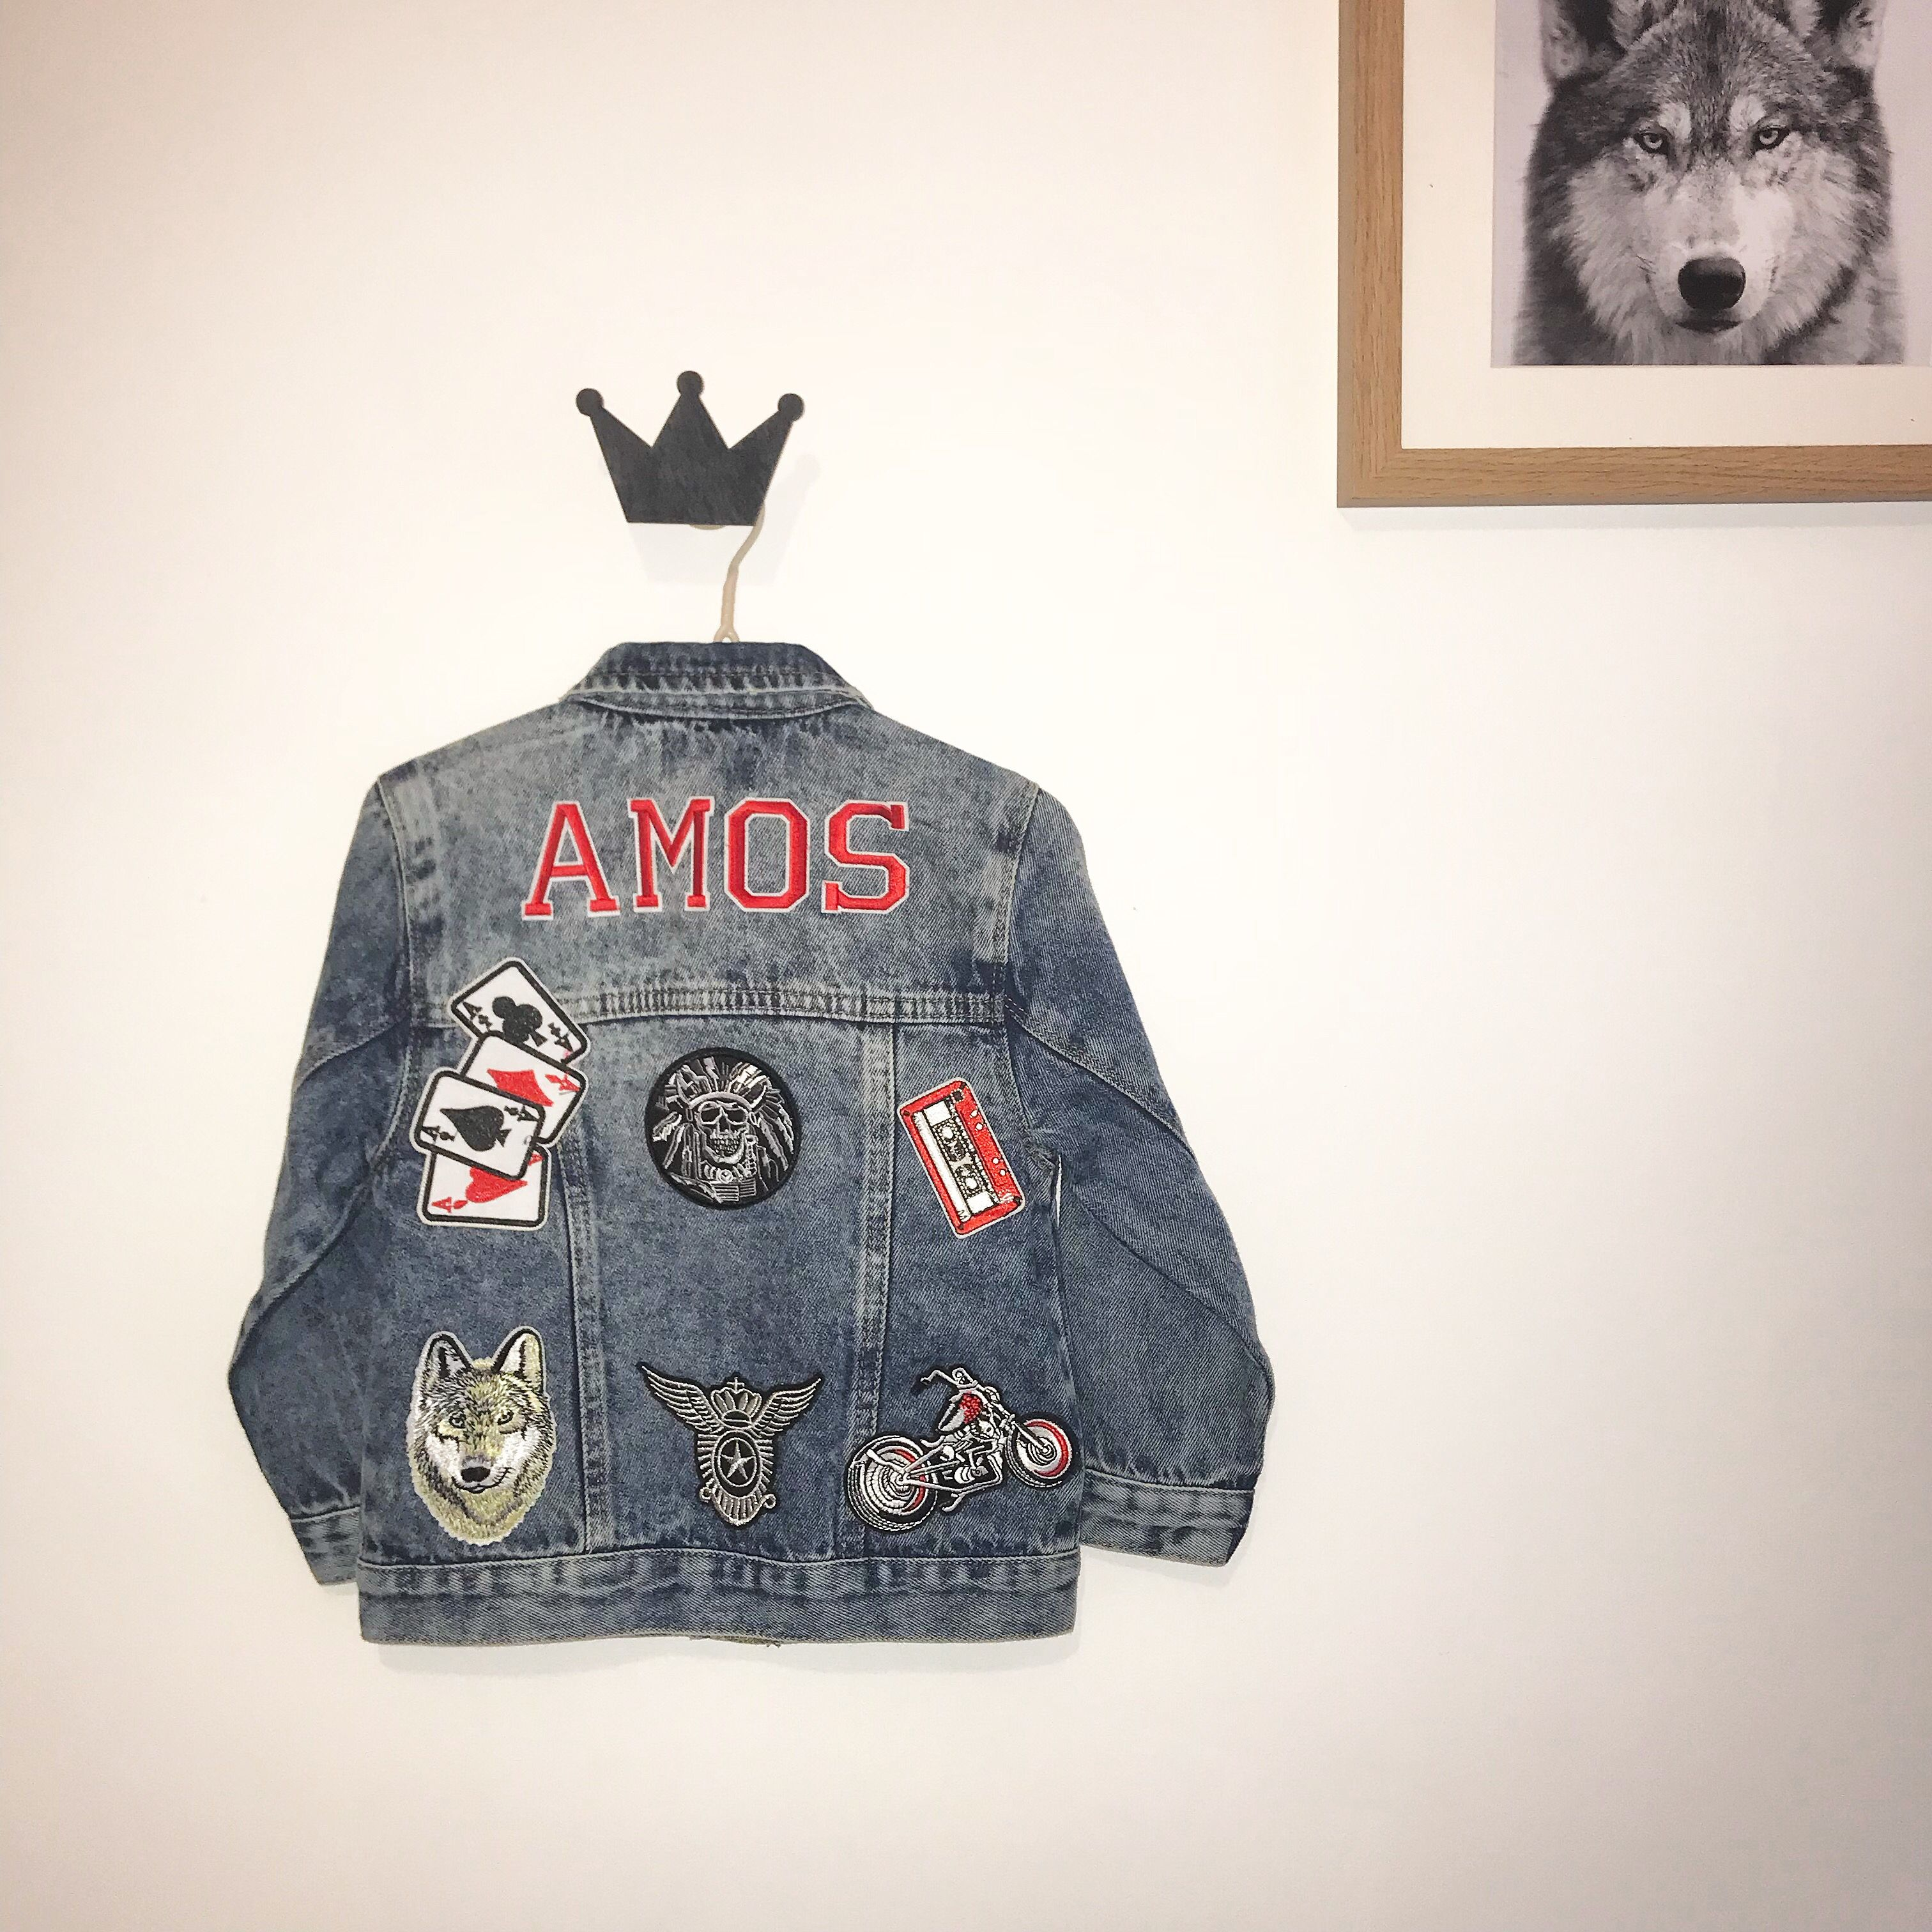 Saint + Soldier custom made personalised denim jacket